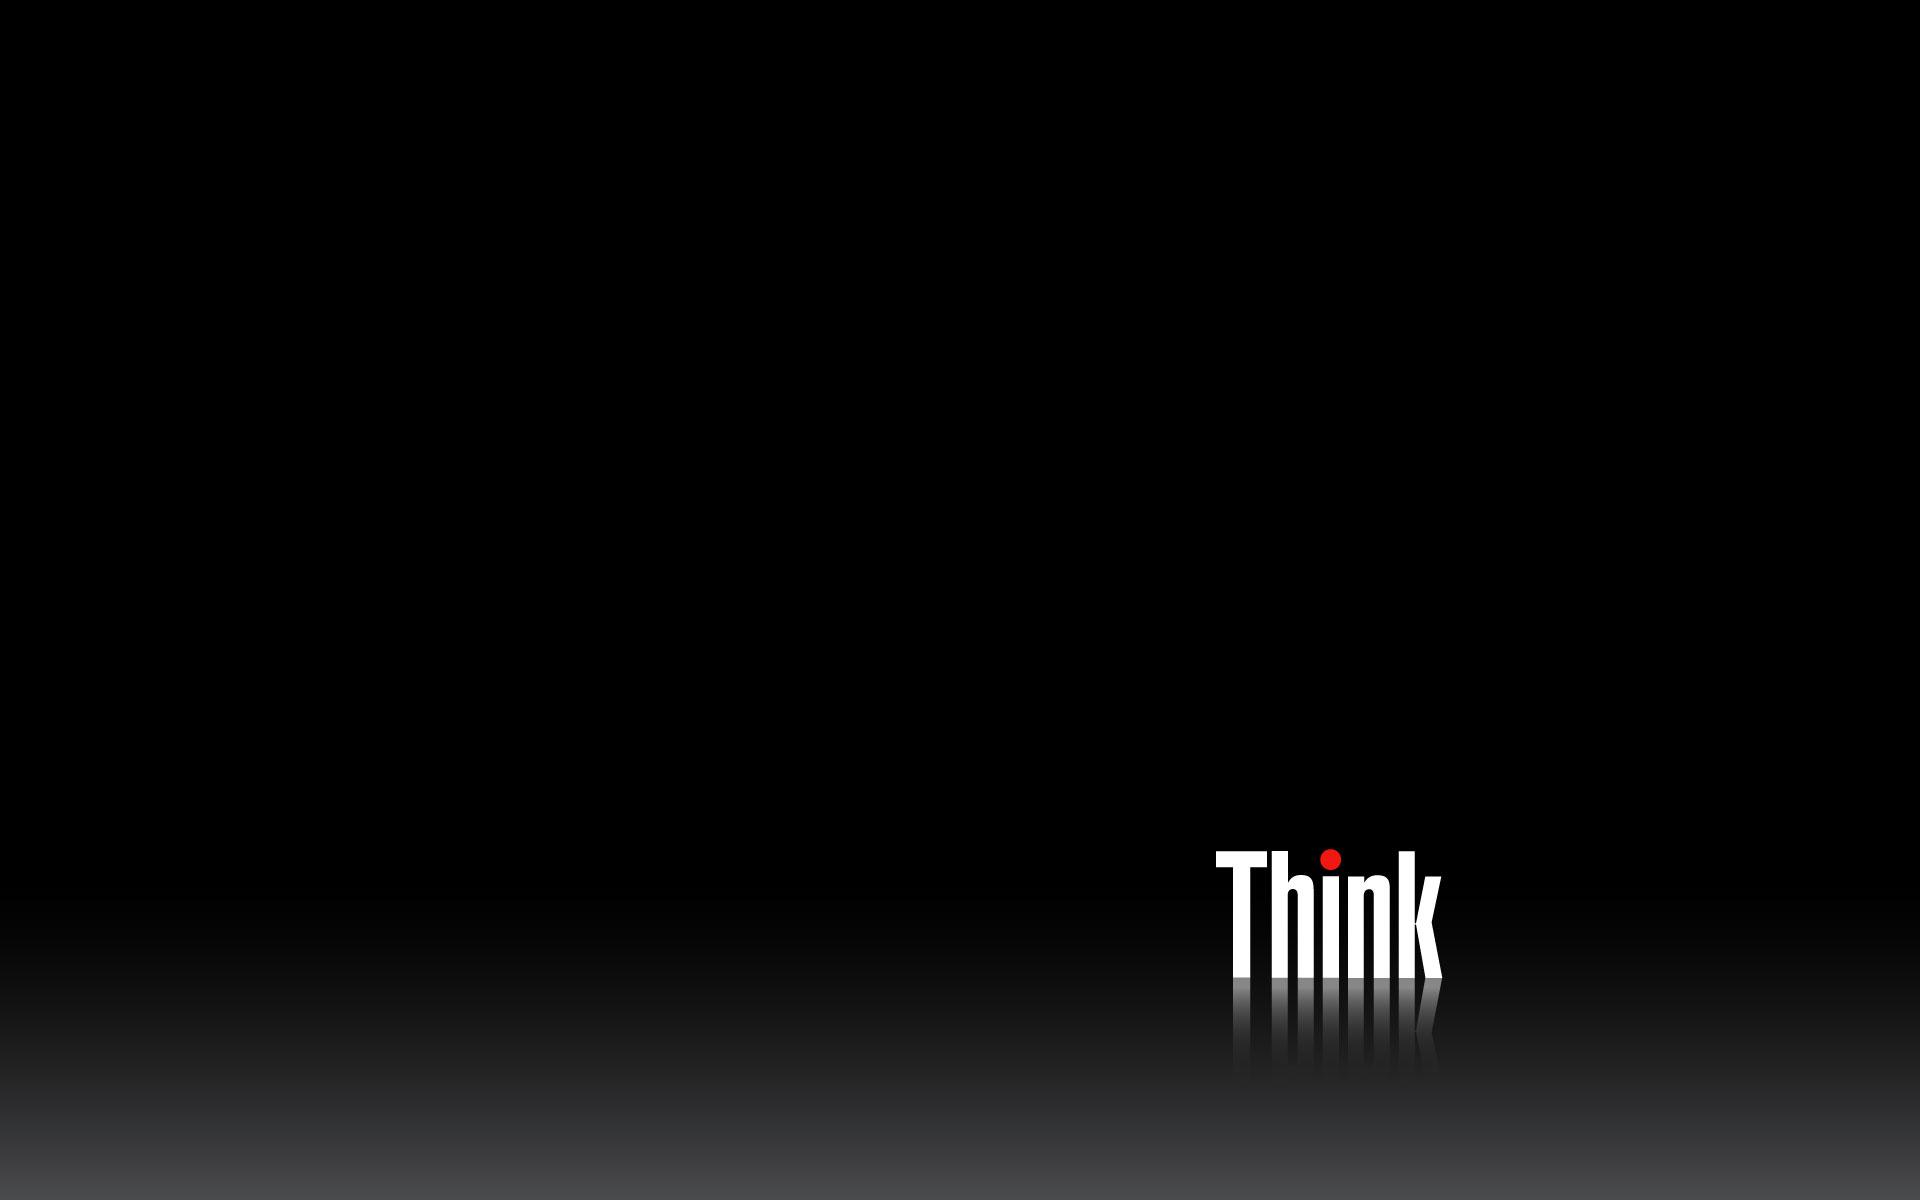 Lenovo ThinkPad Original Wallpapers